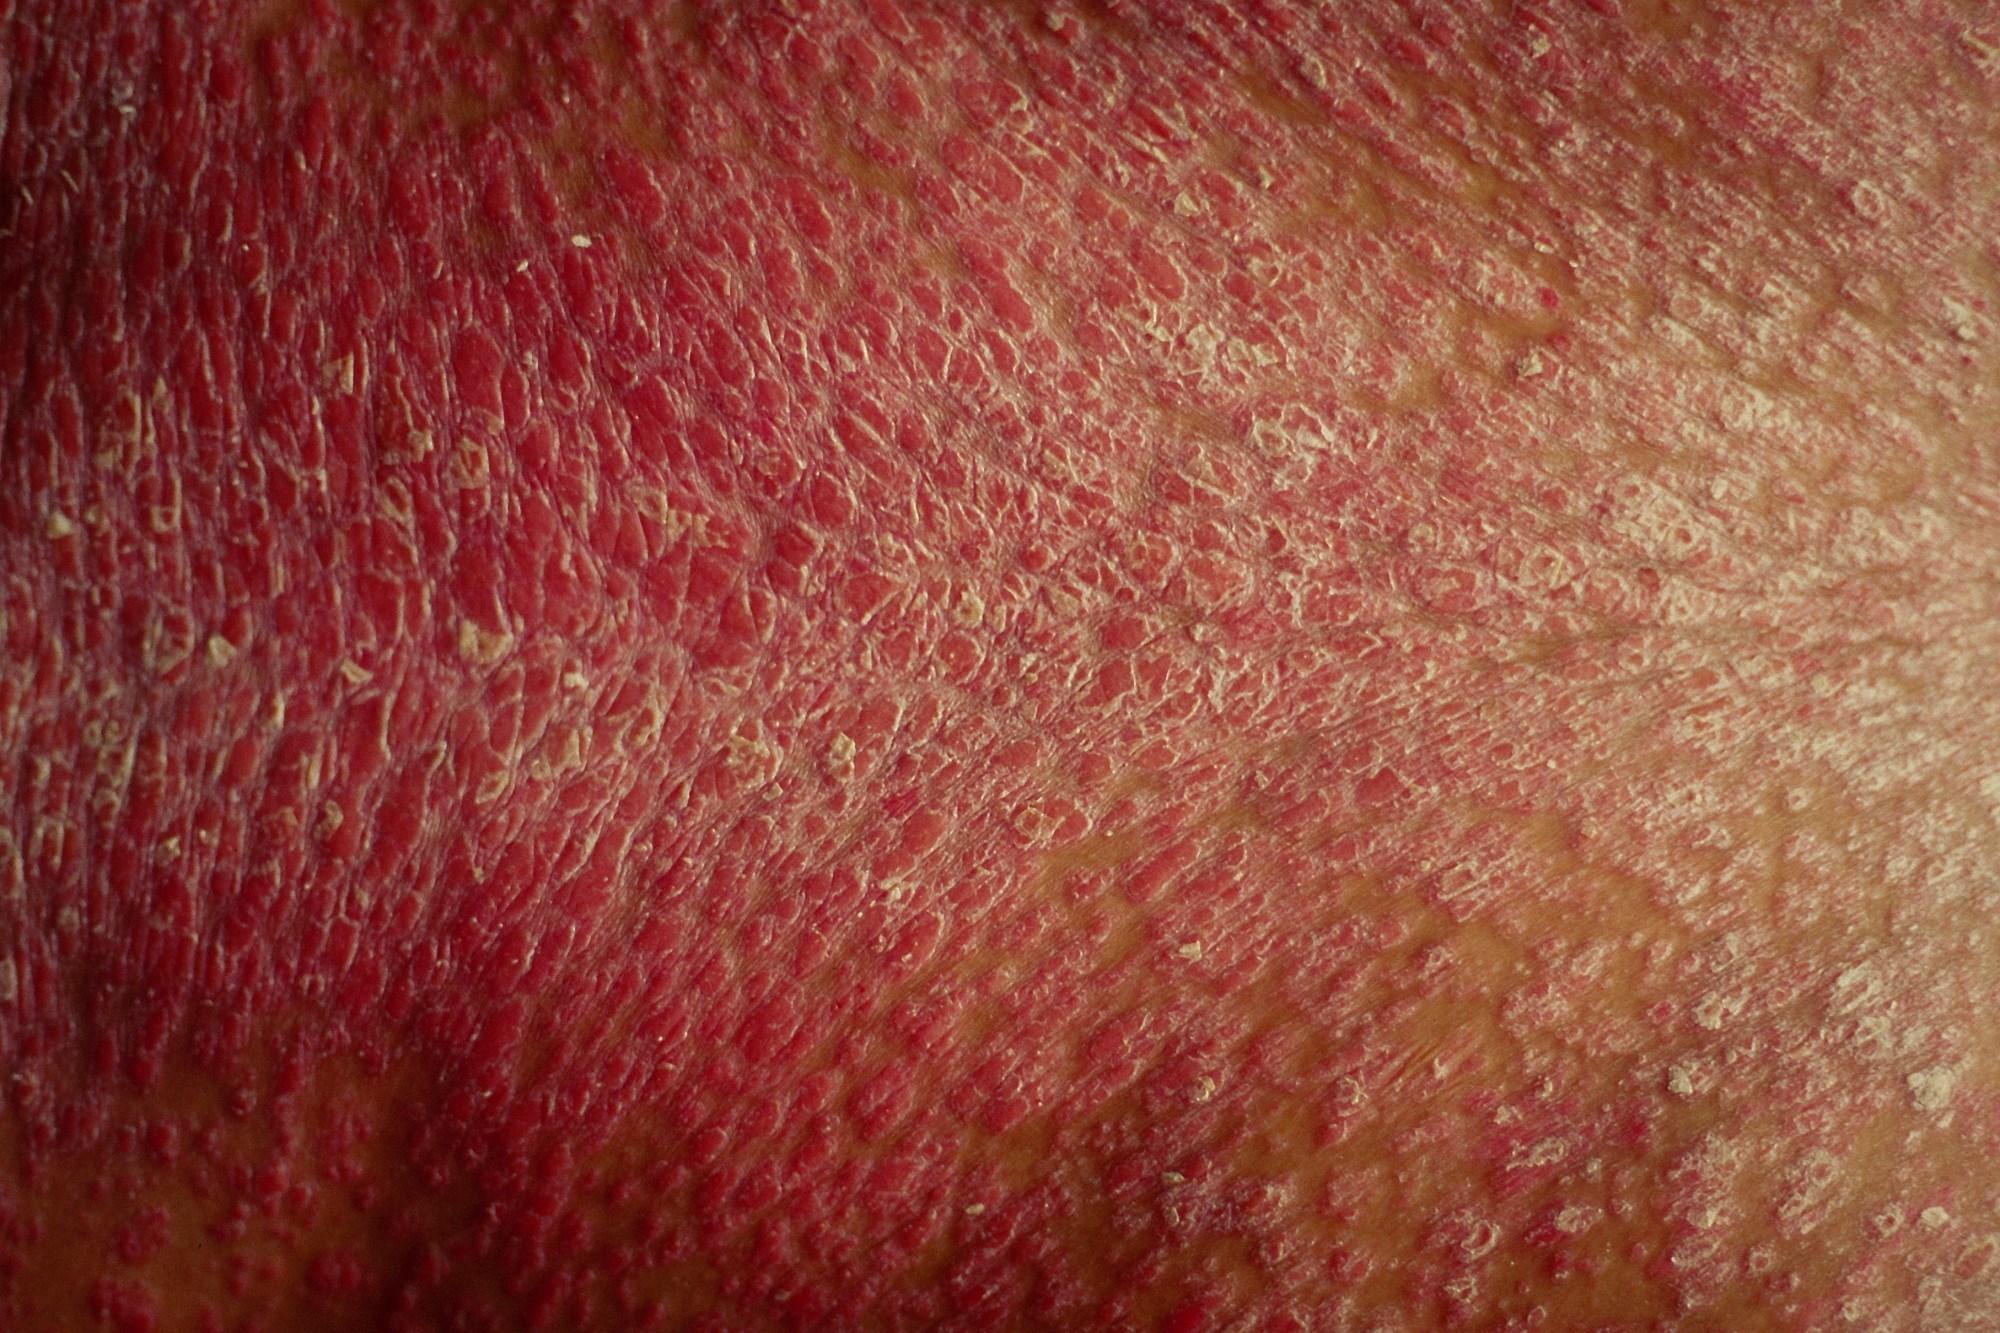 Ixekizumab Superior to Ustekinumab for Clearing Psoriasis Plaques